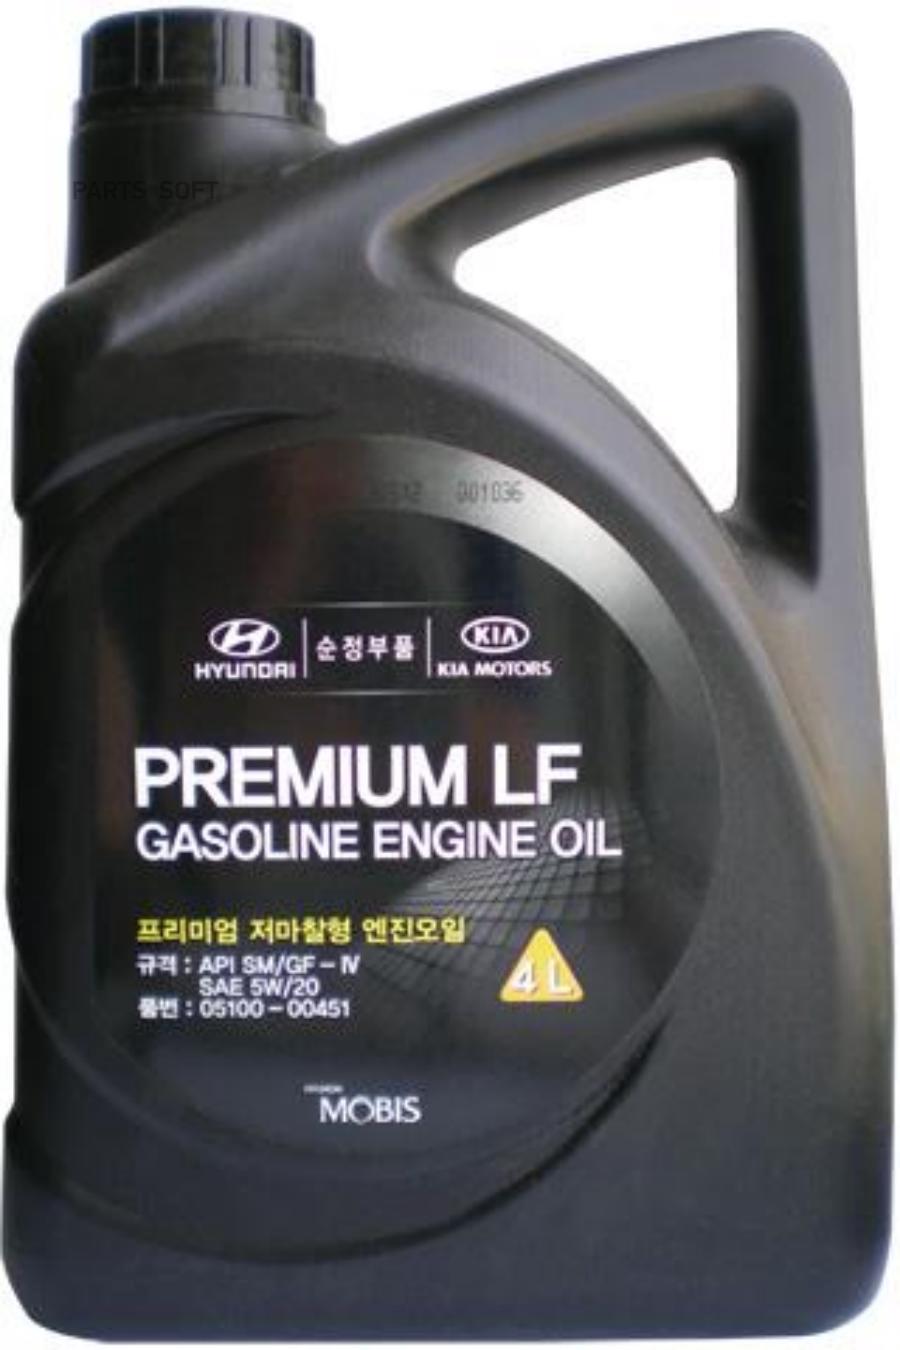 Hyundai/KIA Premium LF Gasoline SAE 5W-20 SM/GF-4 .